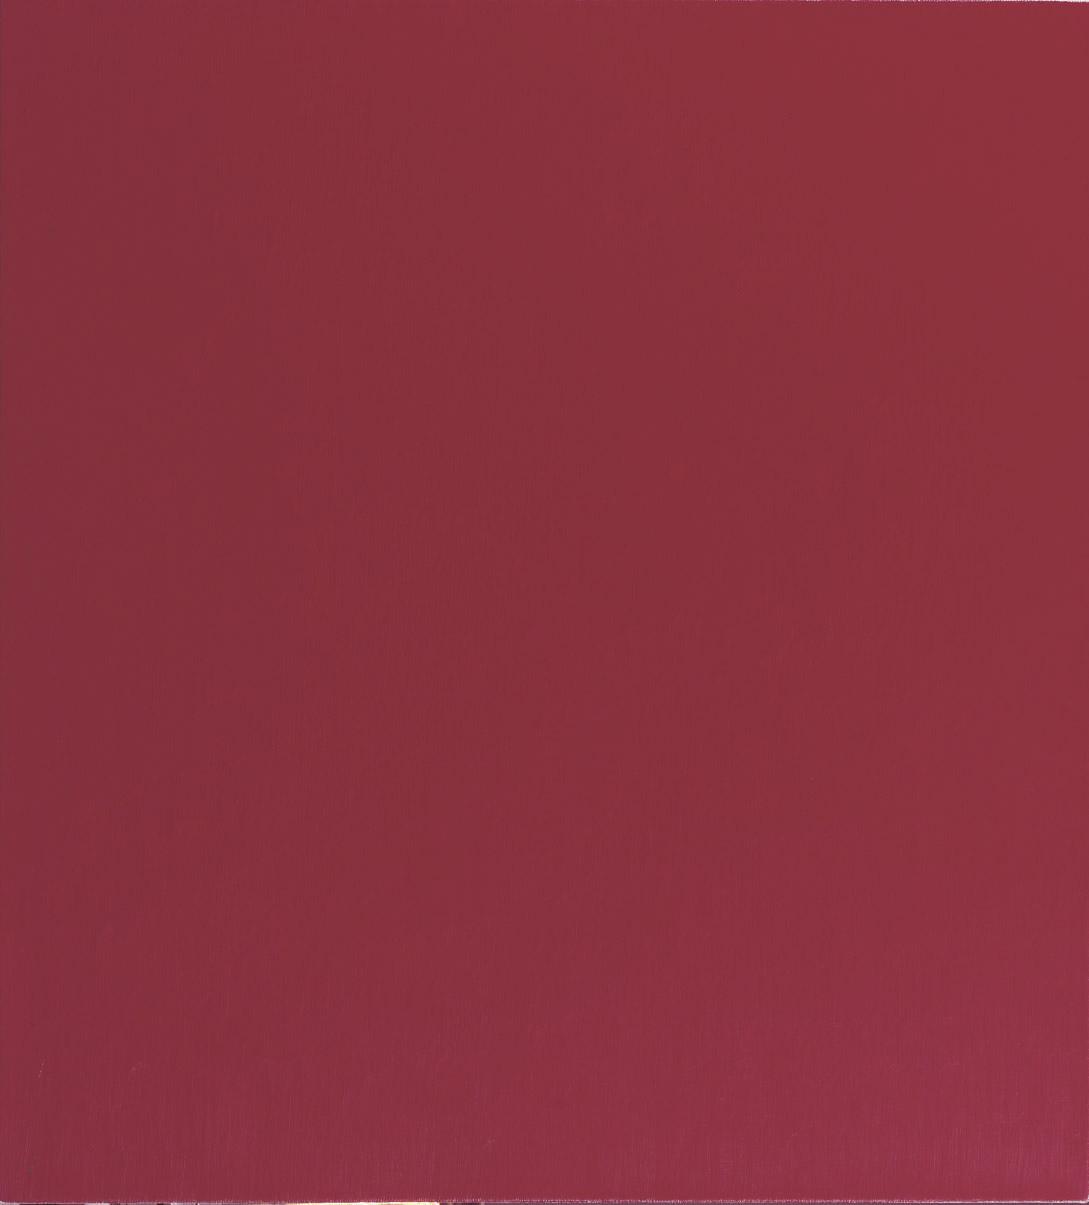 Late roman painting: Irgazine ruby